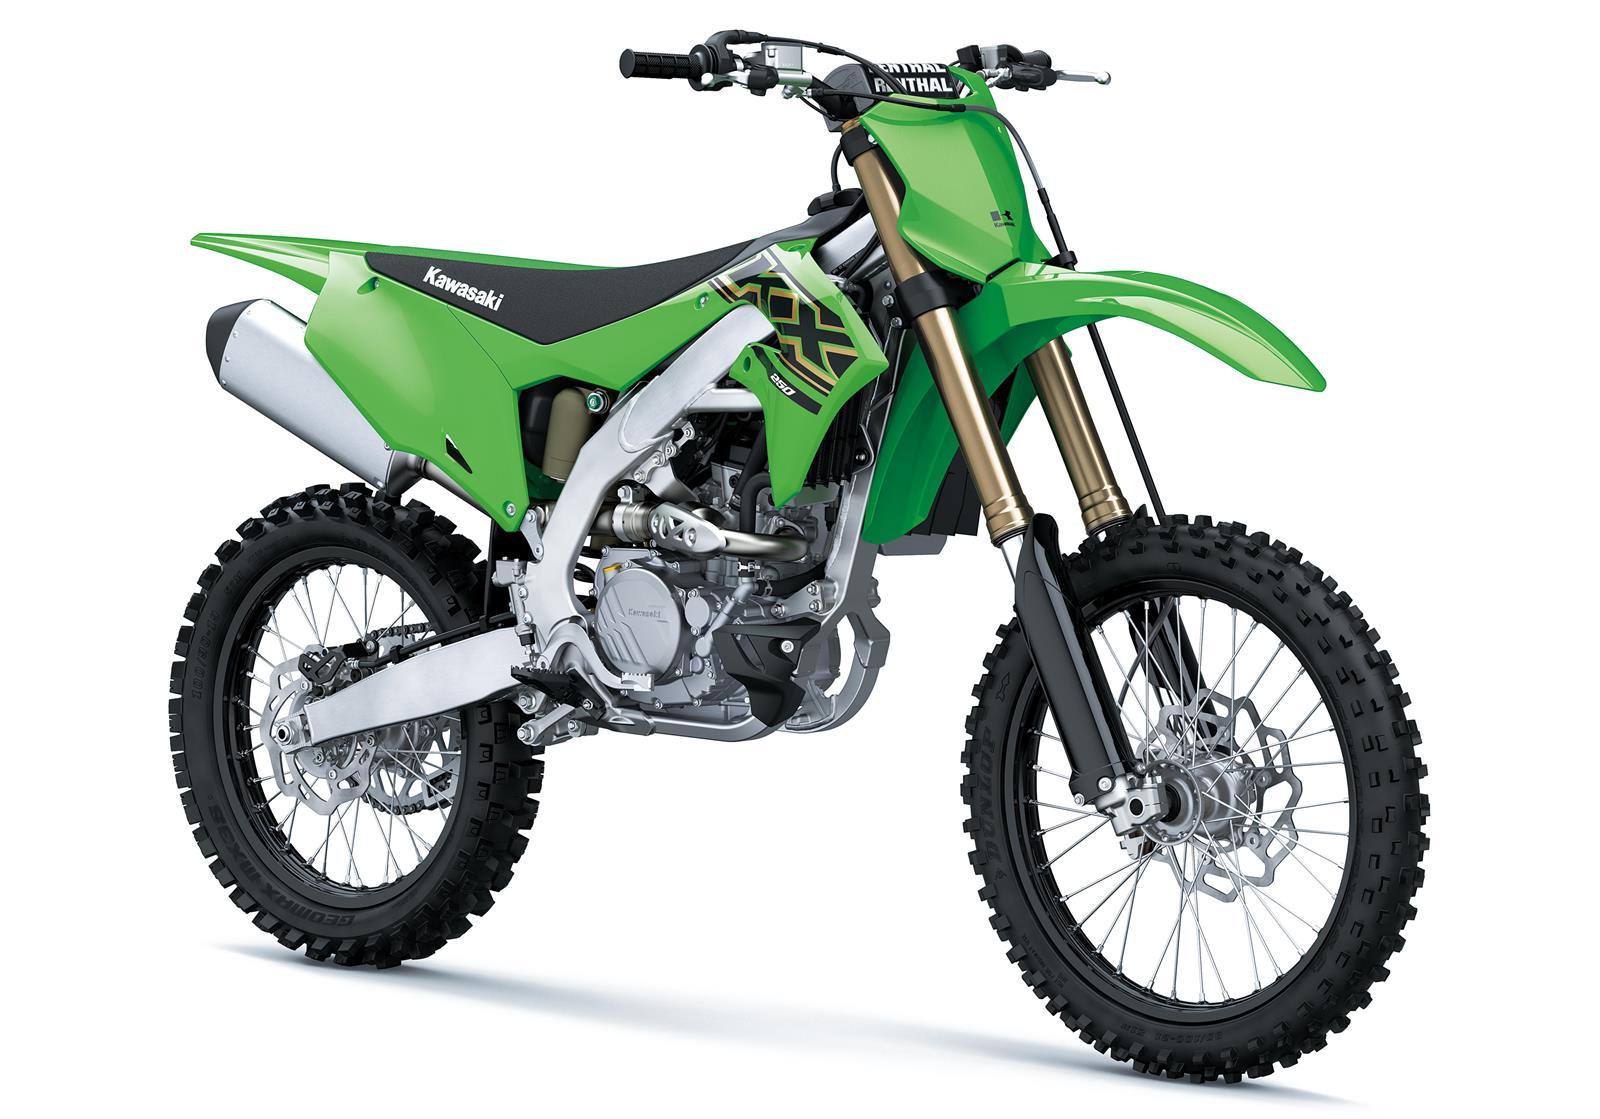 KX250 -1